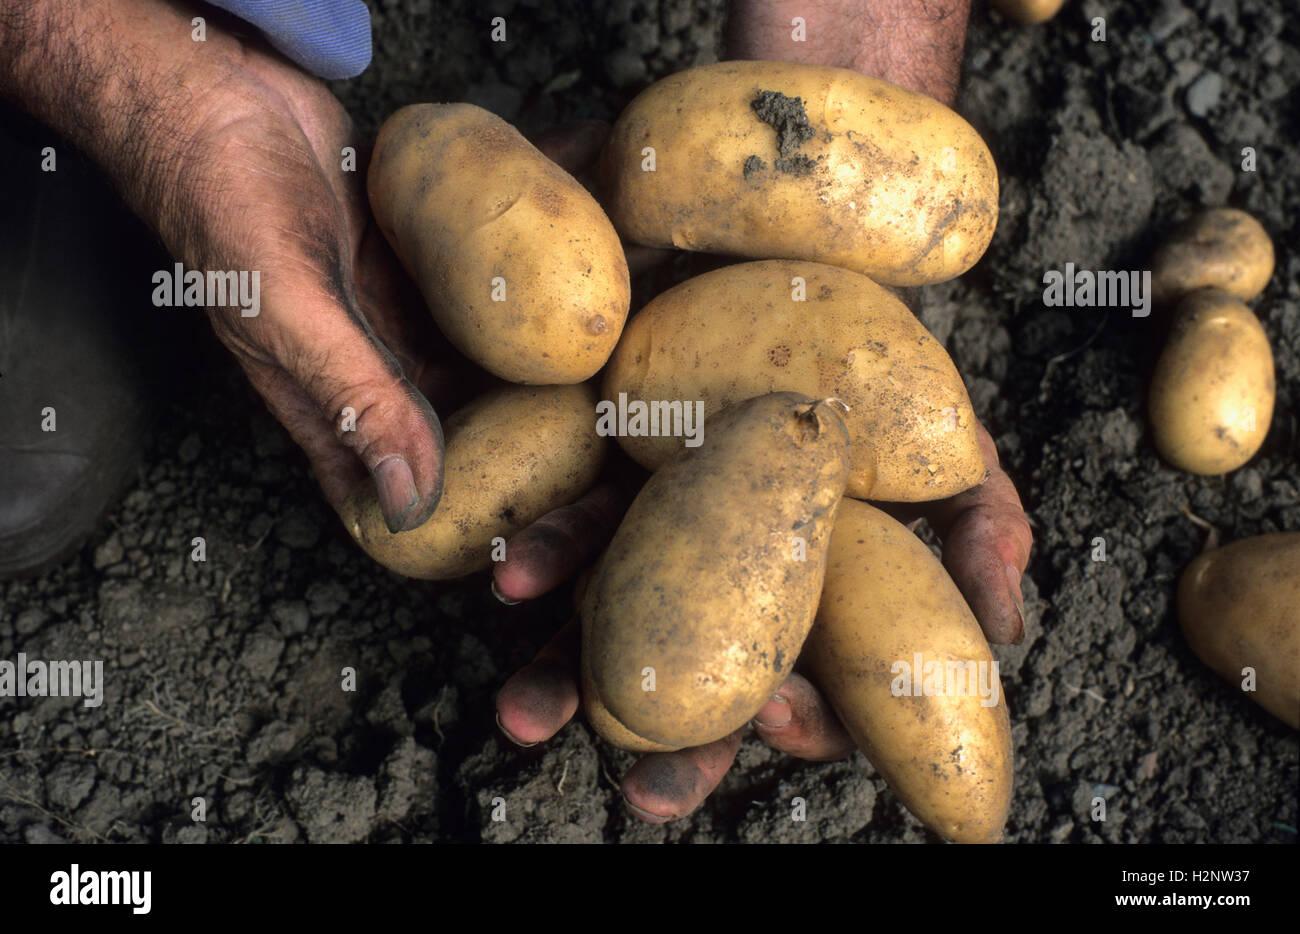 Dirty hands of gardener holding potatoes Stock Photo: 122182571 - Alamy